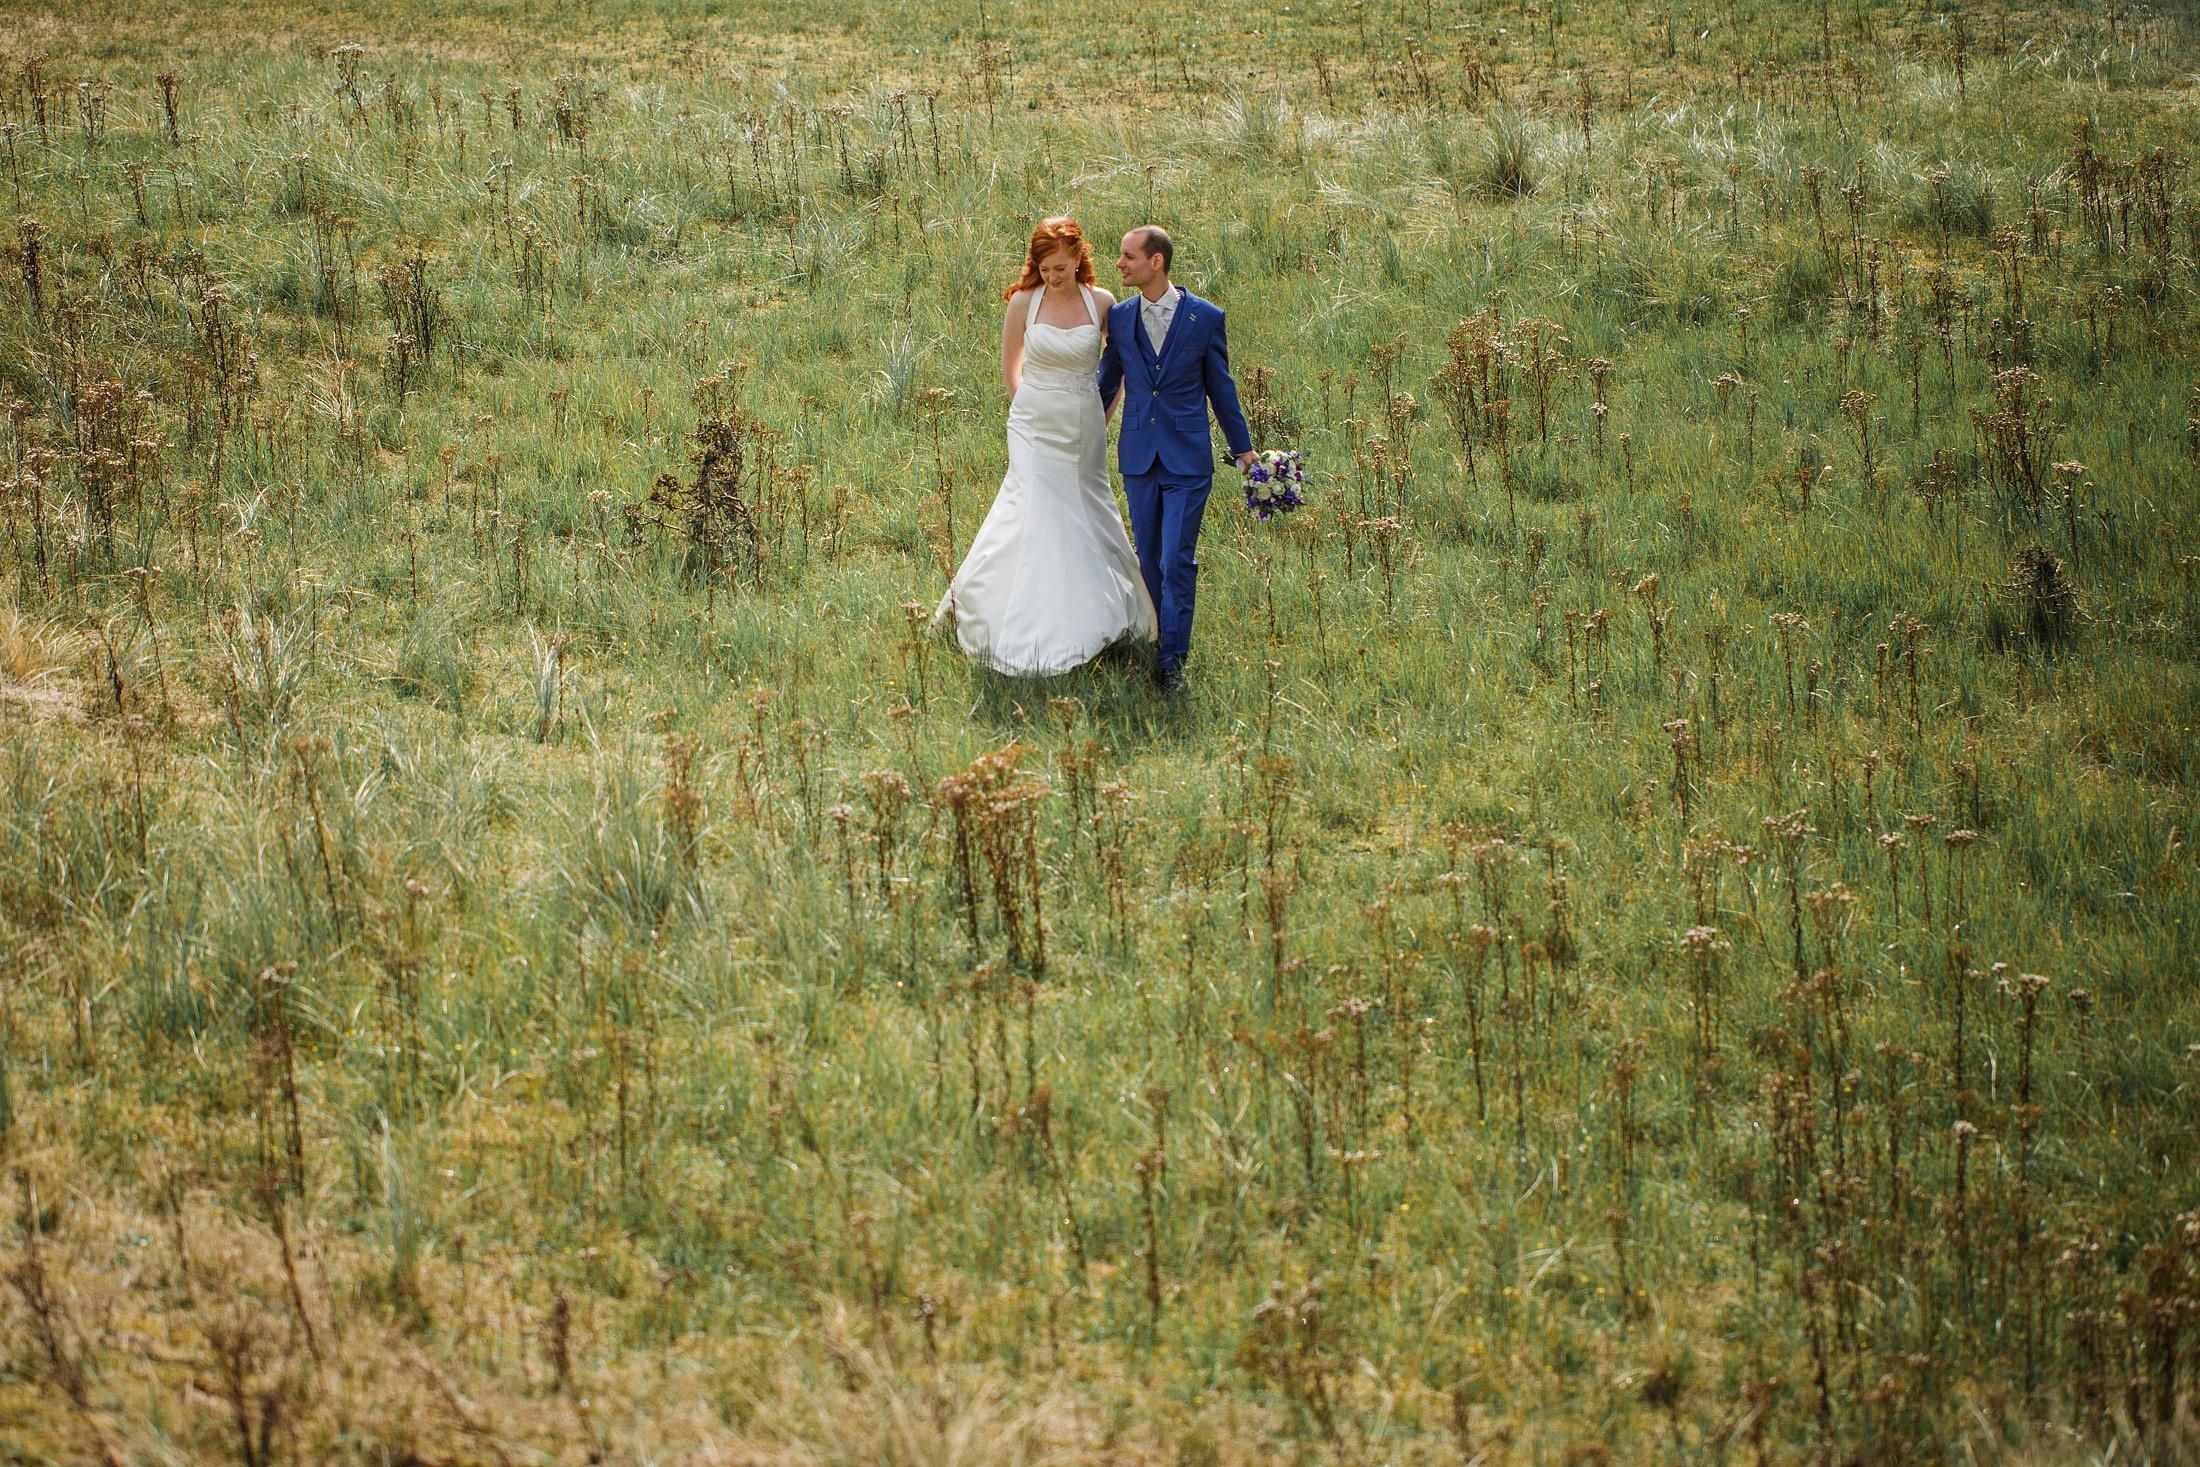 fotoshoot bruidspaar amsterdamse waterleidingduinen zandvoort